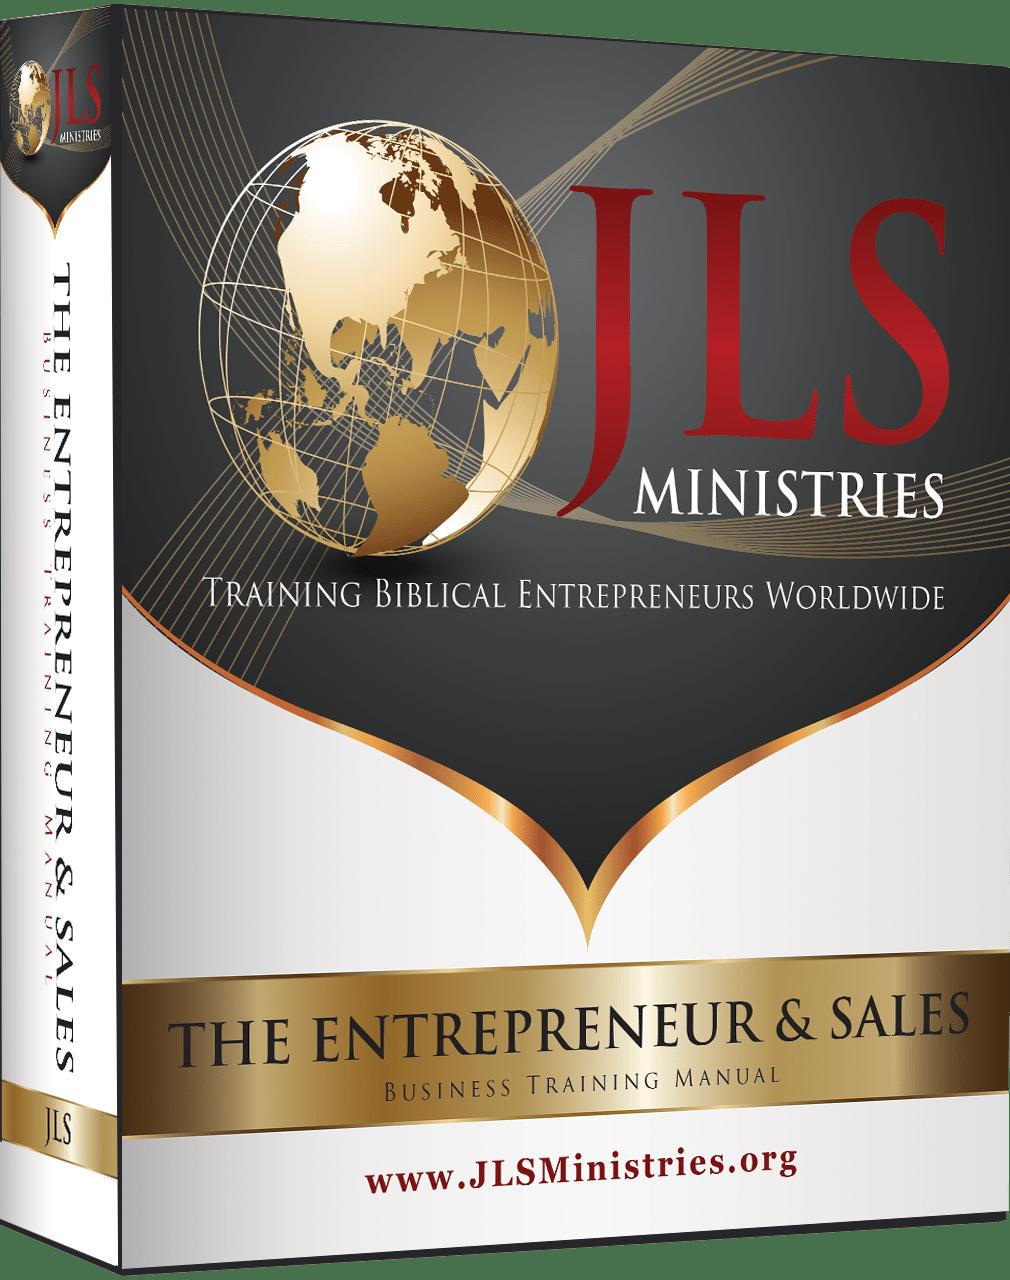 tm-jls0103_business-training-manual